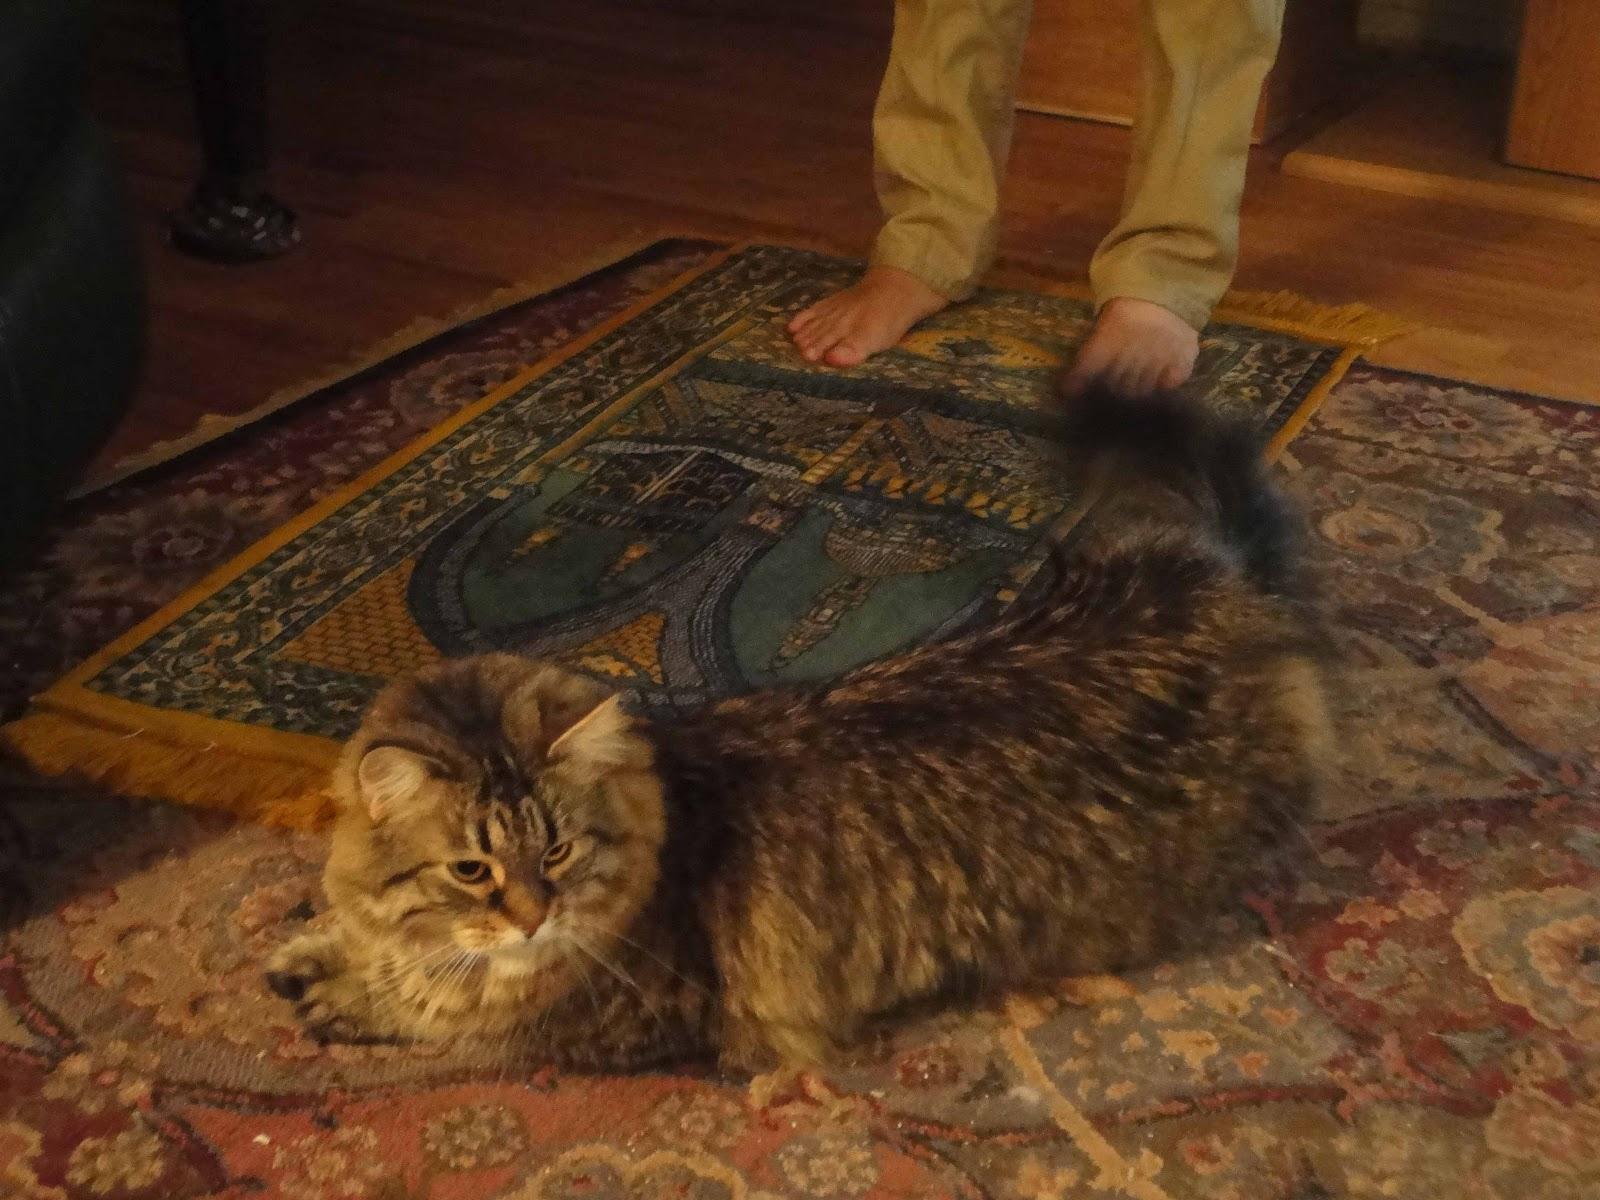 Cats in islam - muslimconverts.com